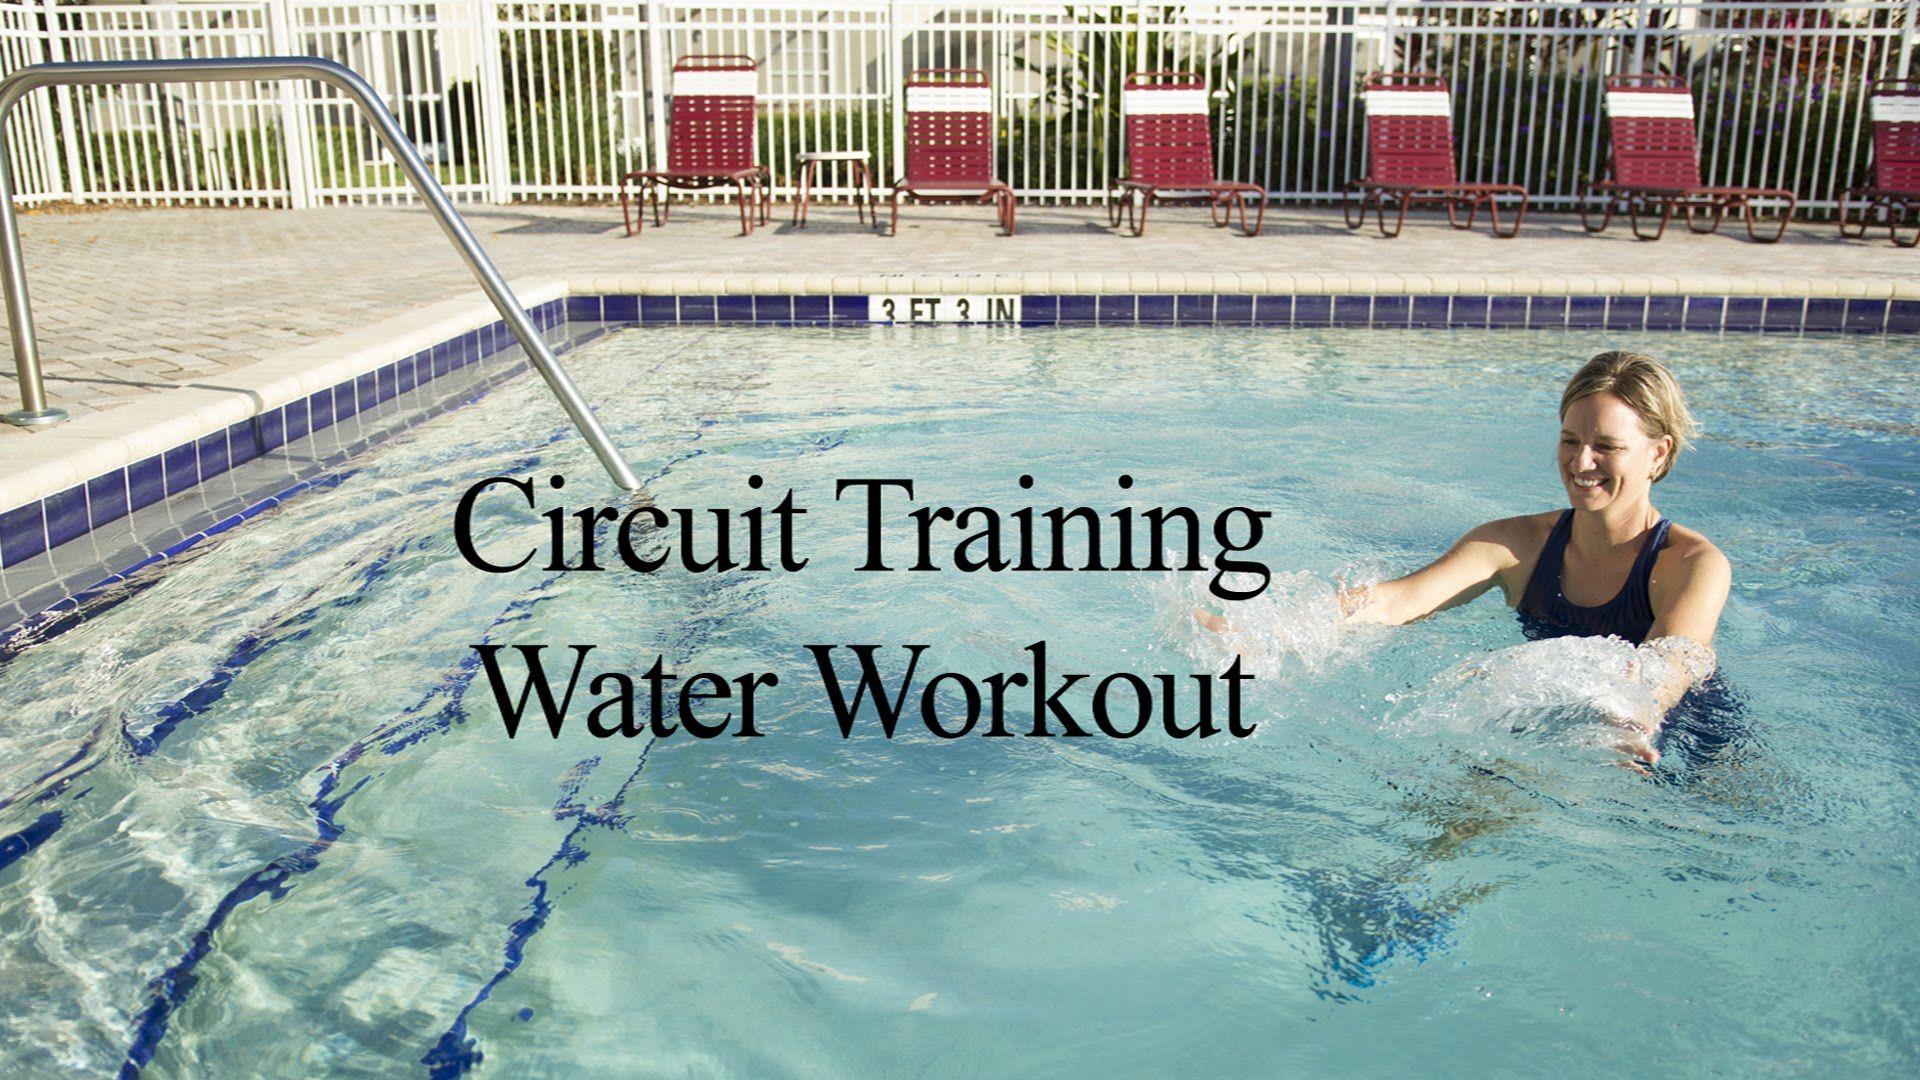 Upper Body Aqua Circuit Training 1 Wecoach Water Workouts Pinterest Water Aerobics